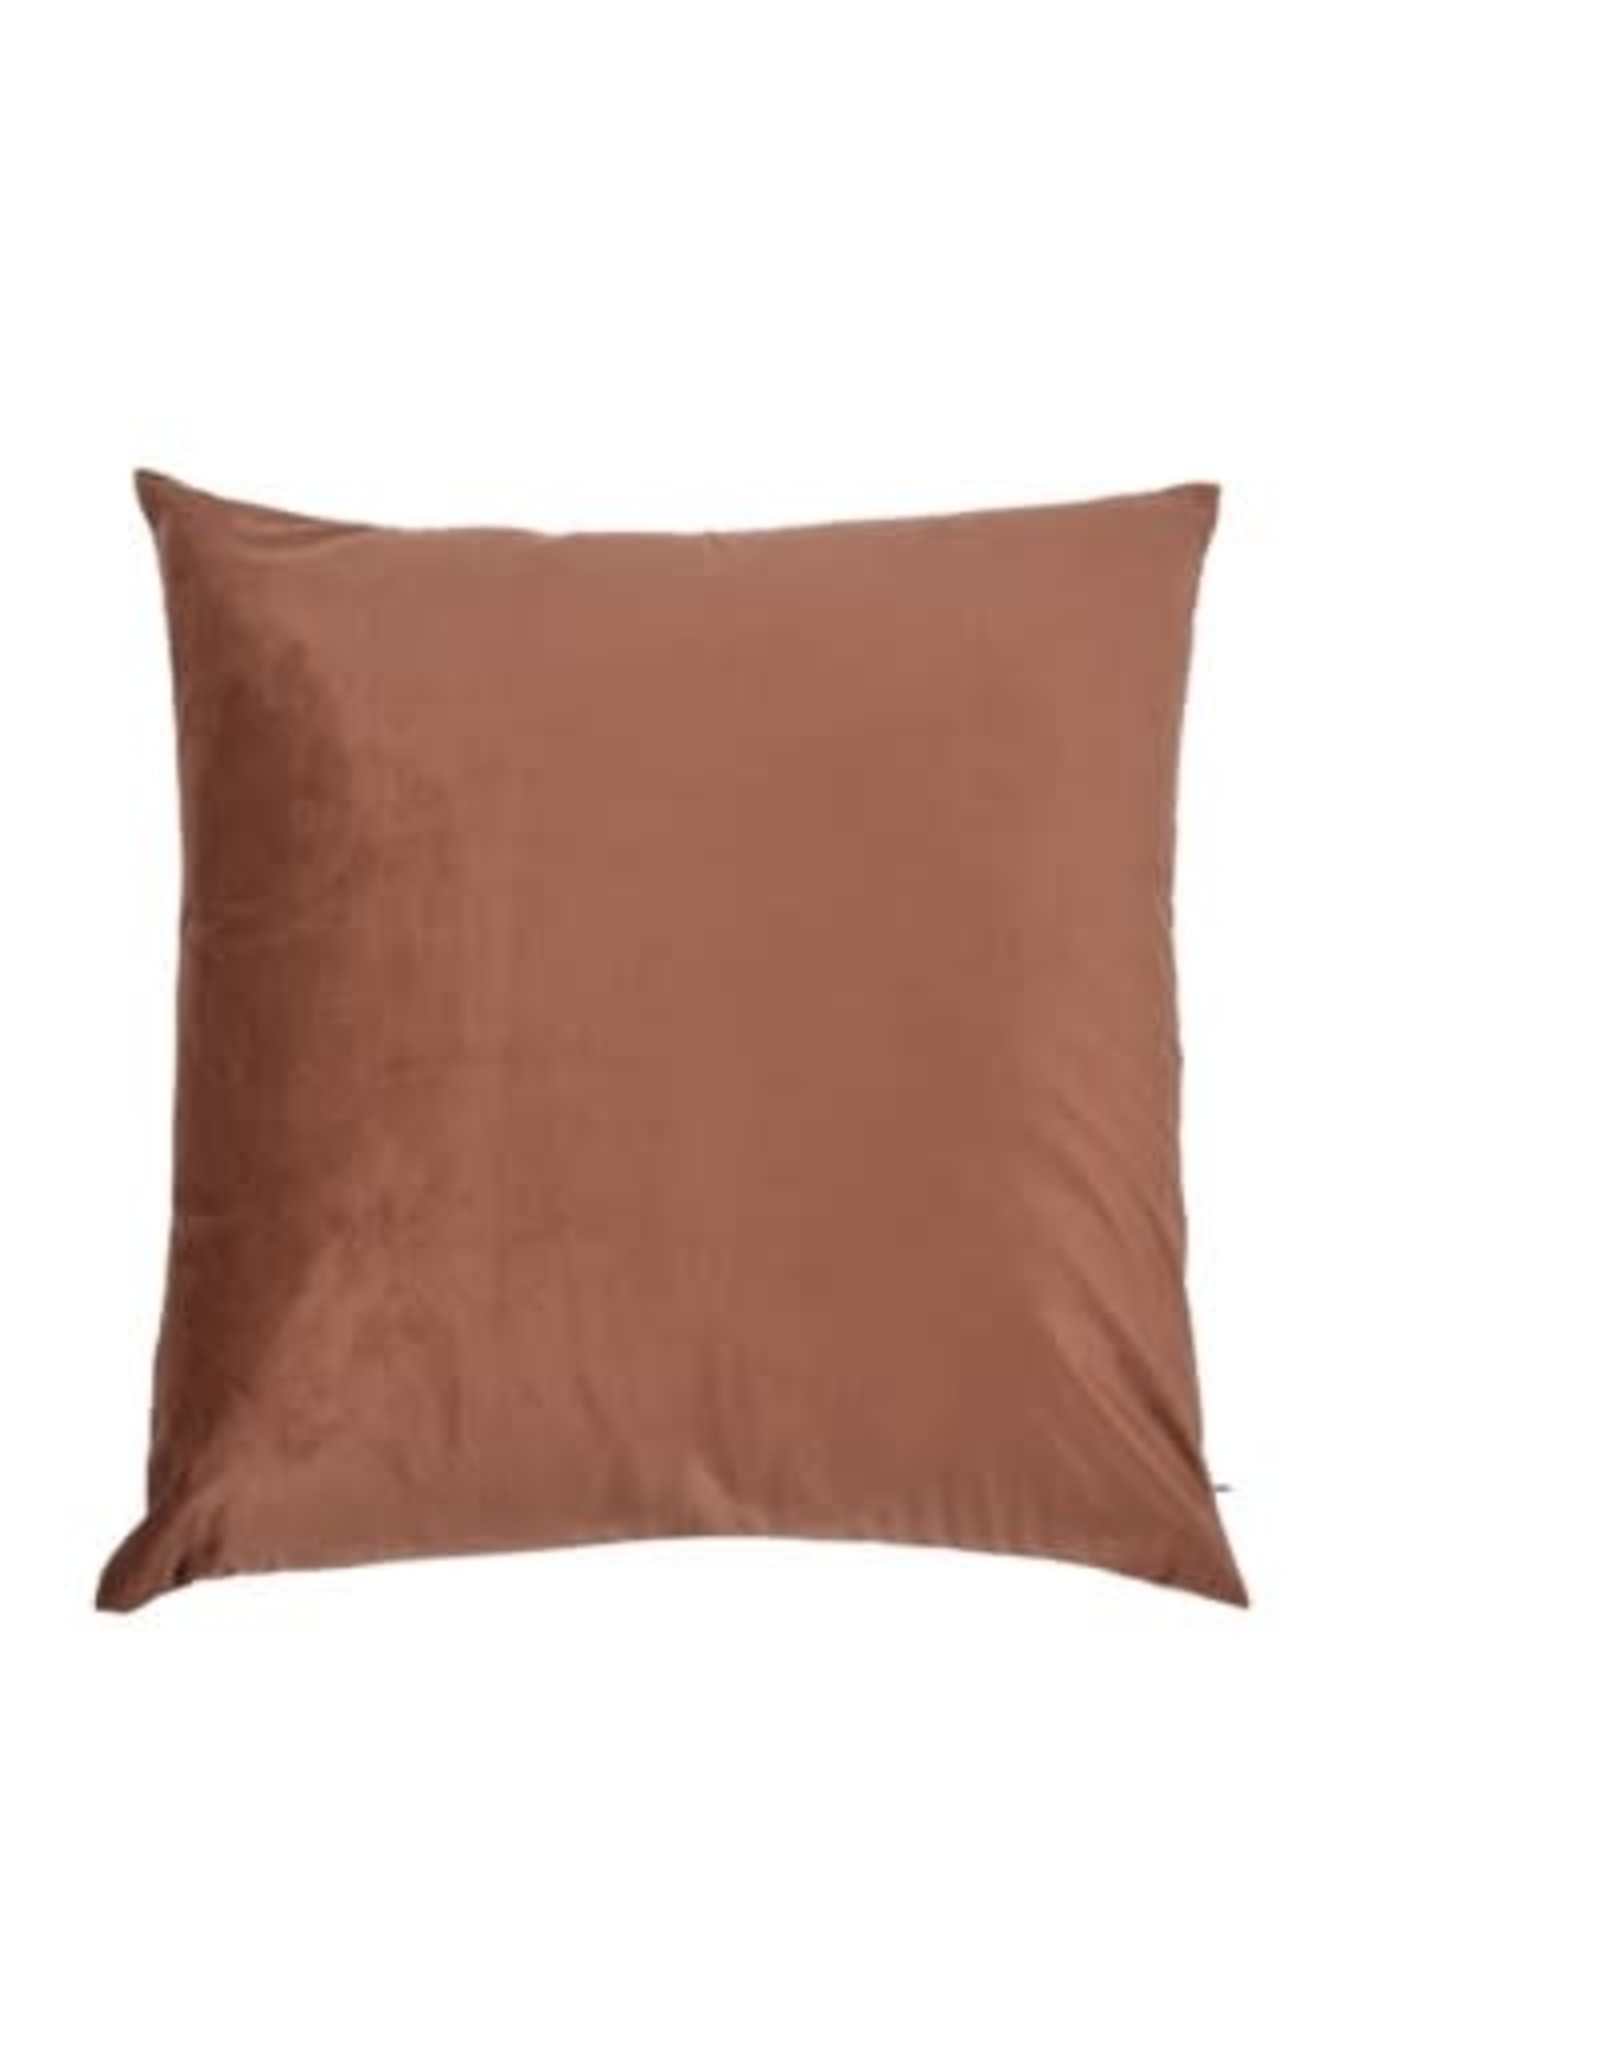 Coussin brun foncé Claudia 20x20